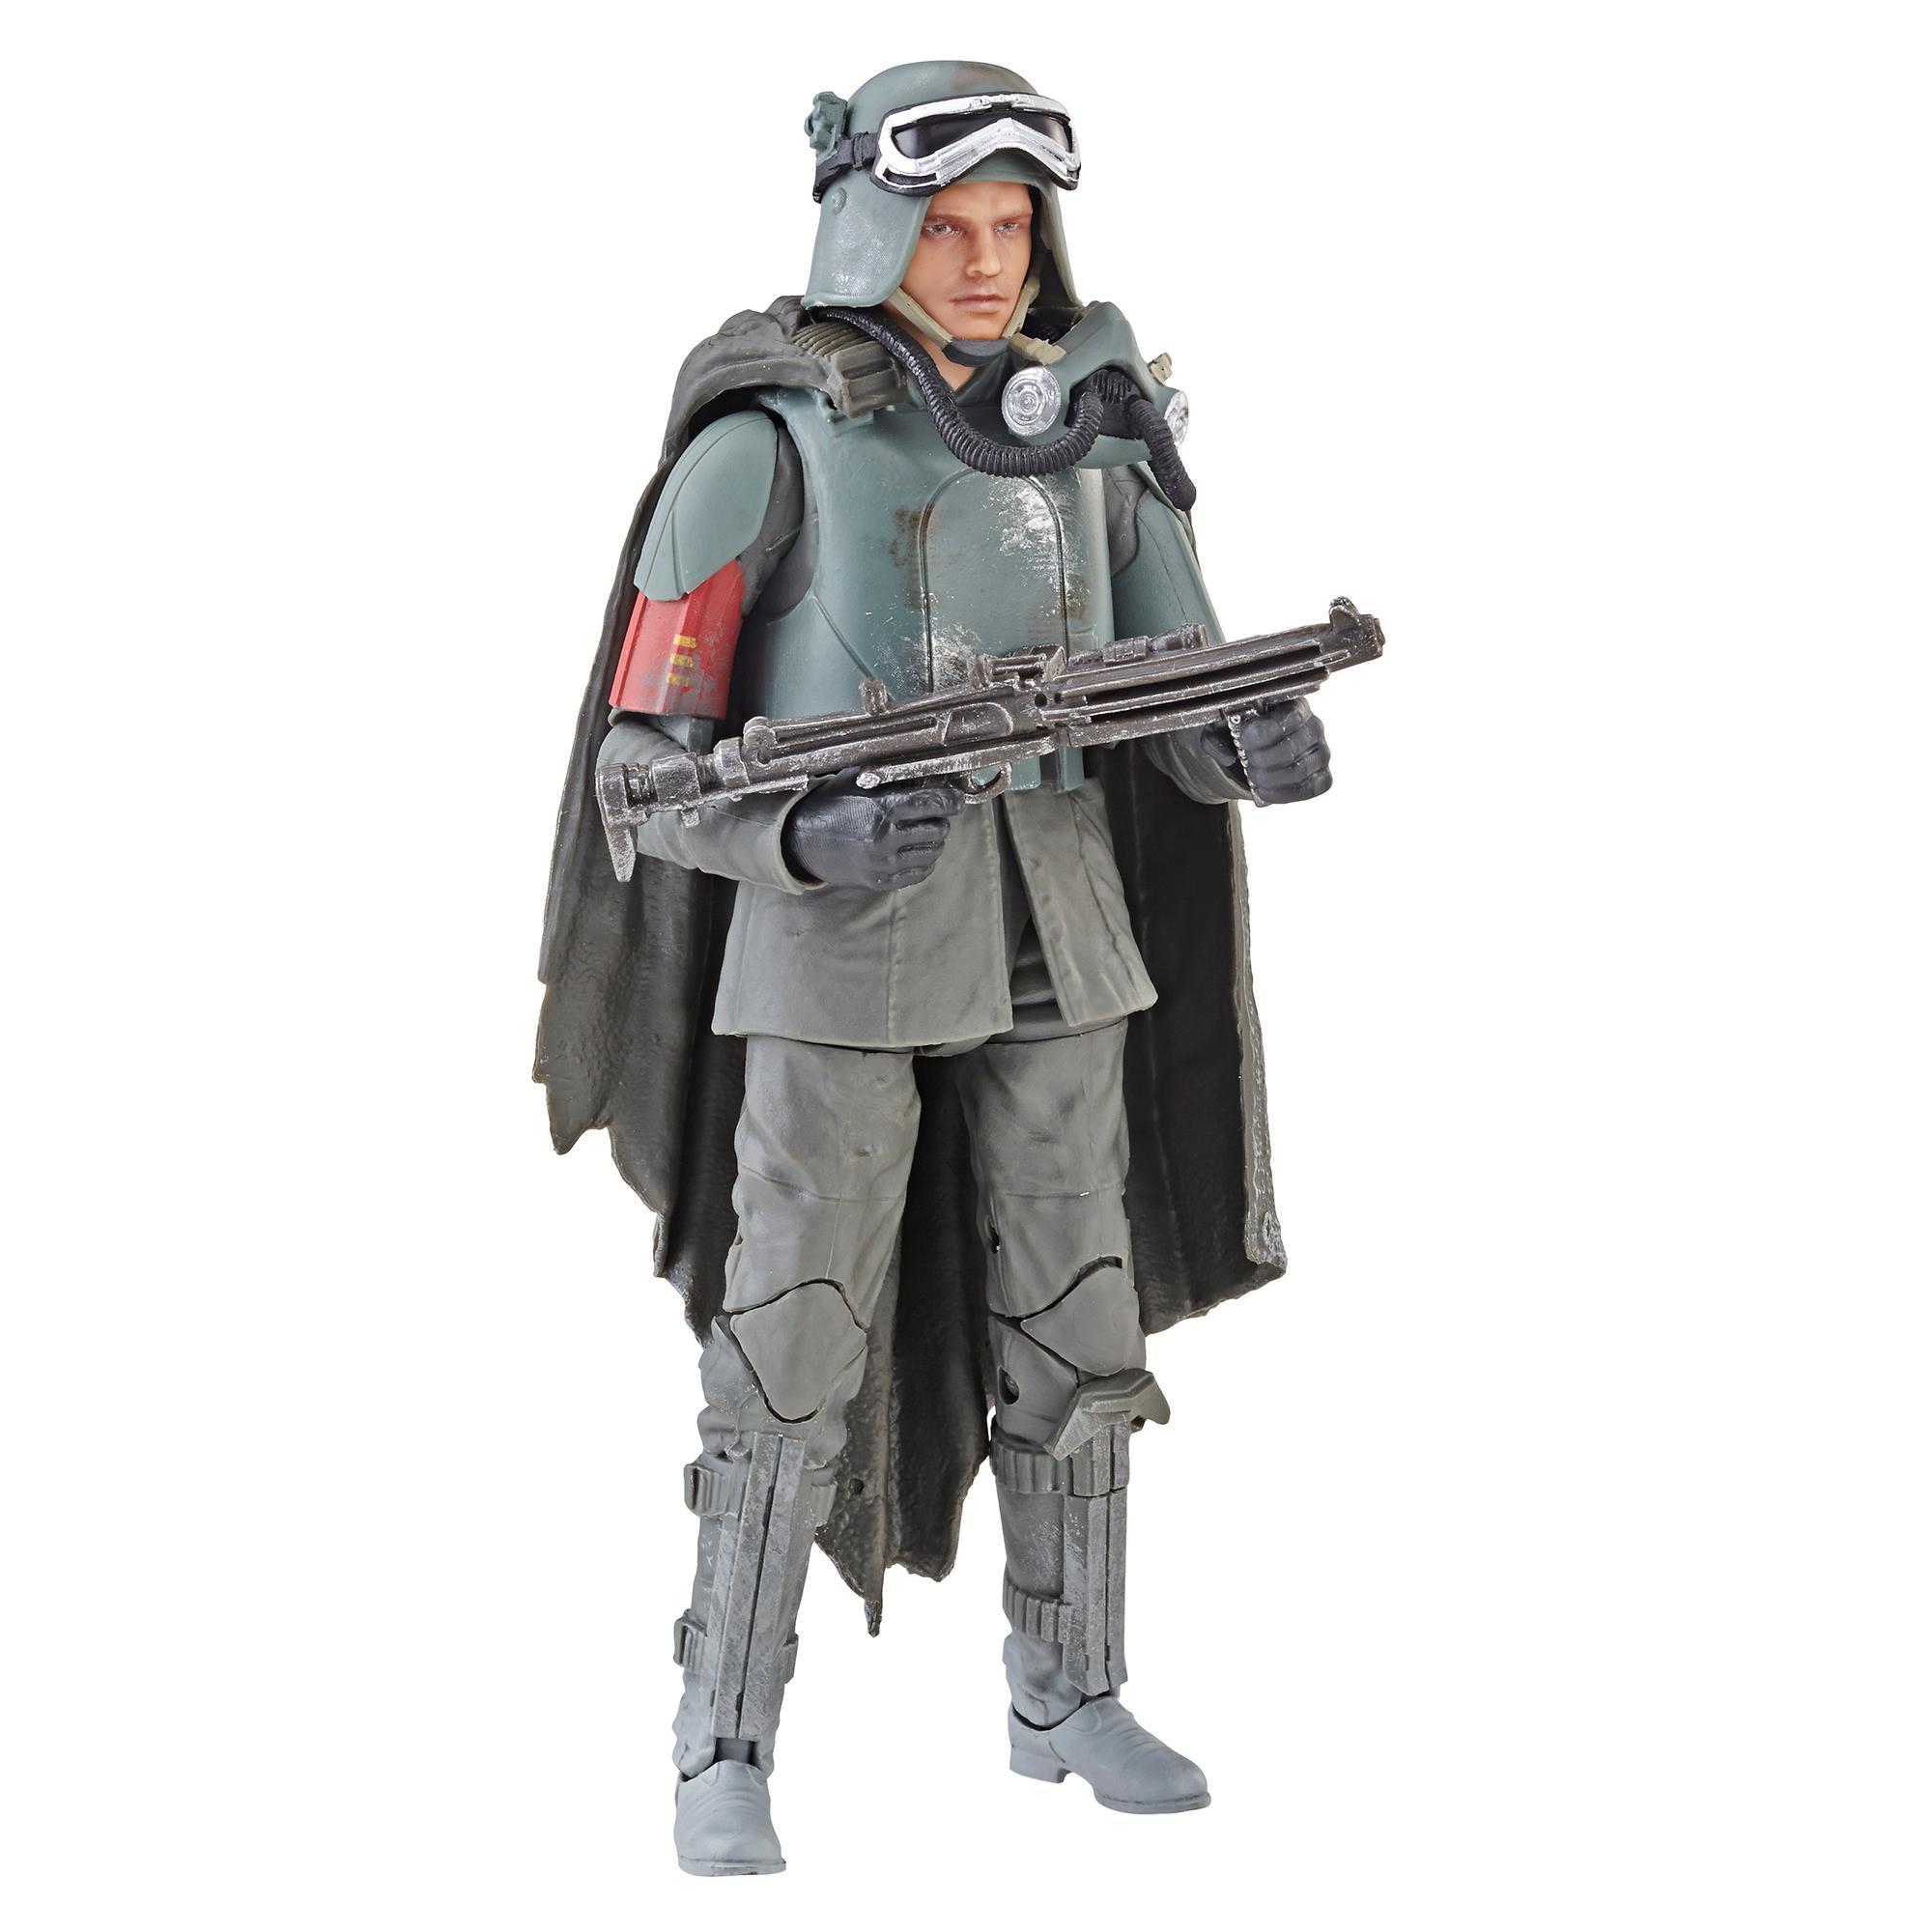 Star Wars The Black Series 6-inch Han Solo (Mimban) Figure